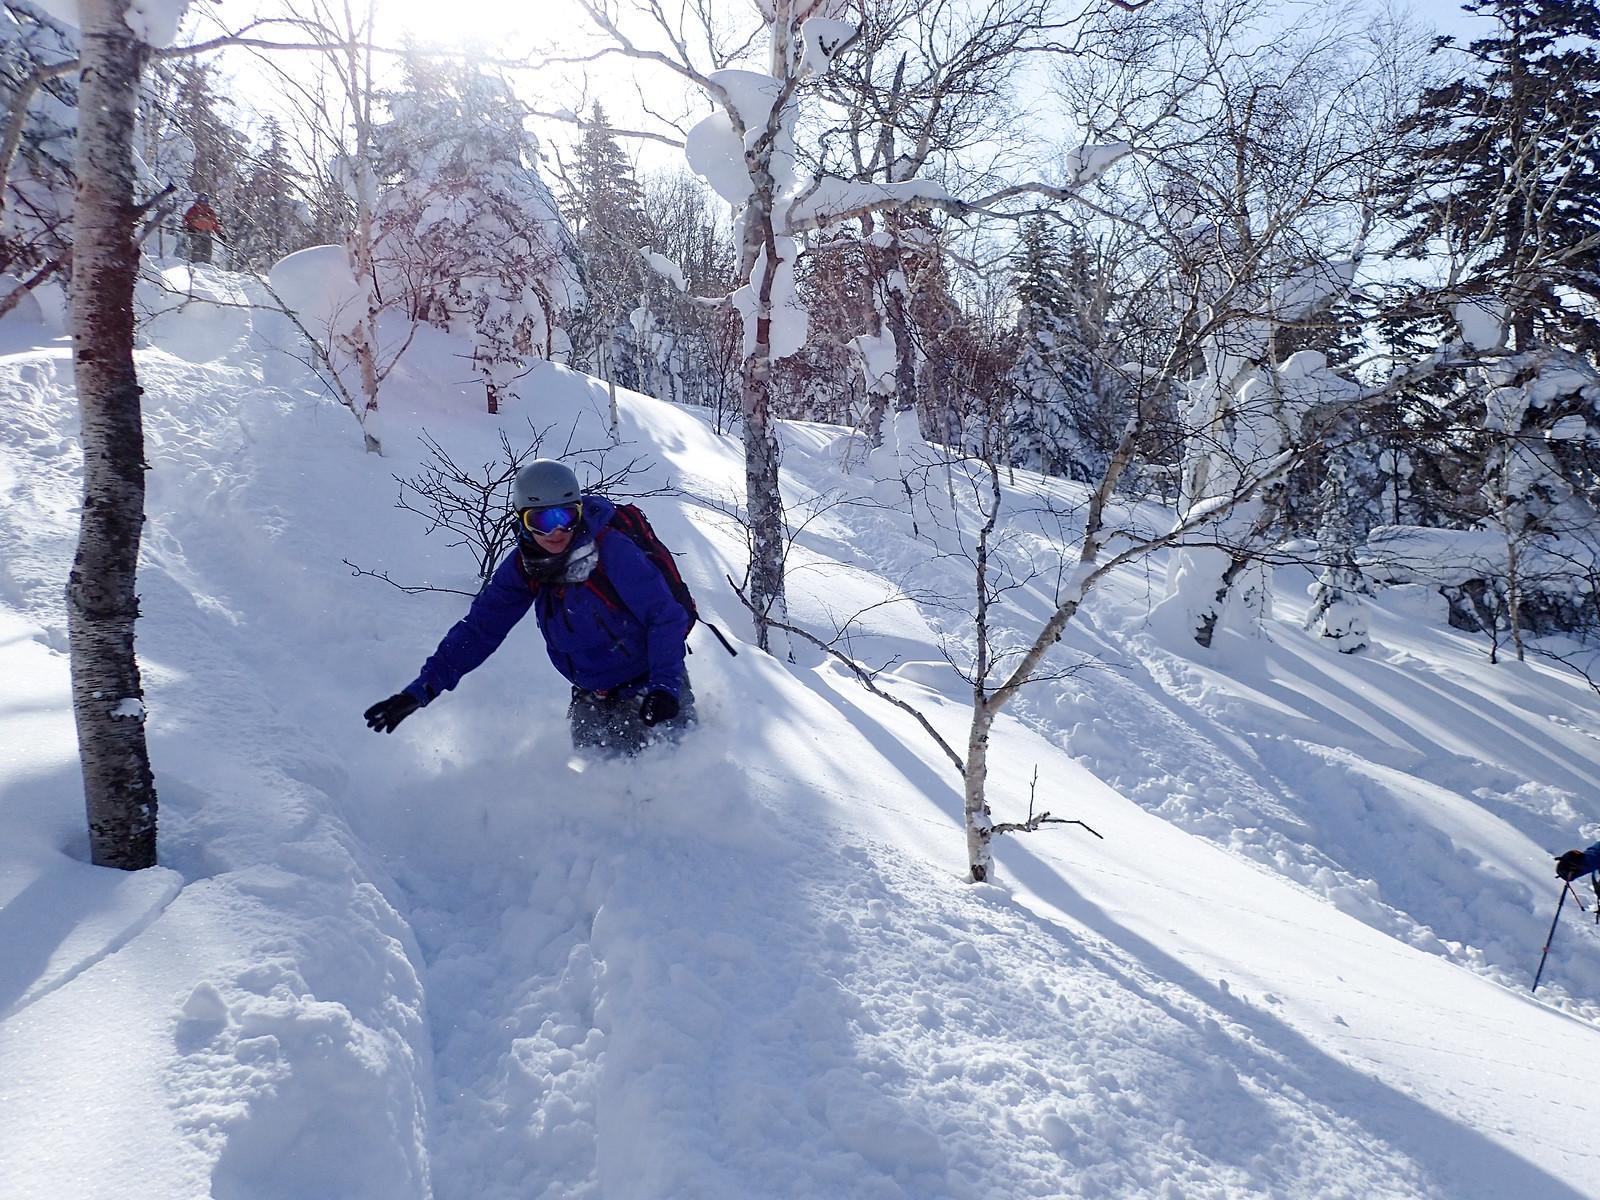 Mt. Furano backcountry ski touring (Hokkaido, Japan)